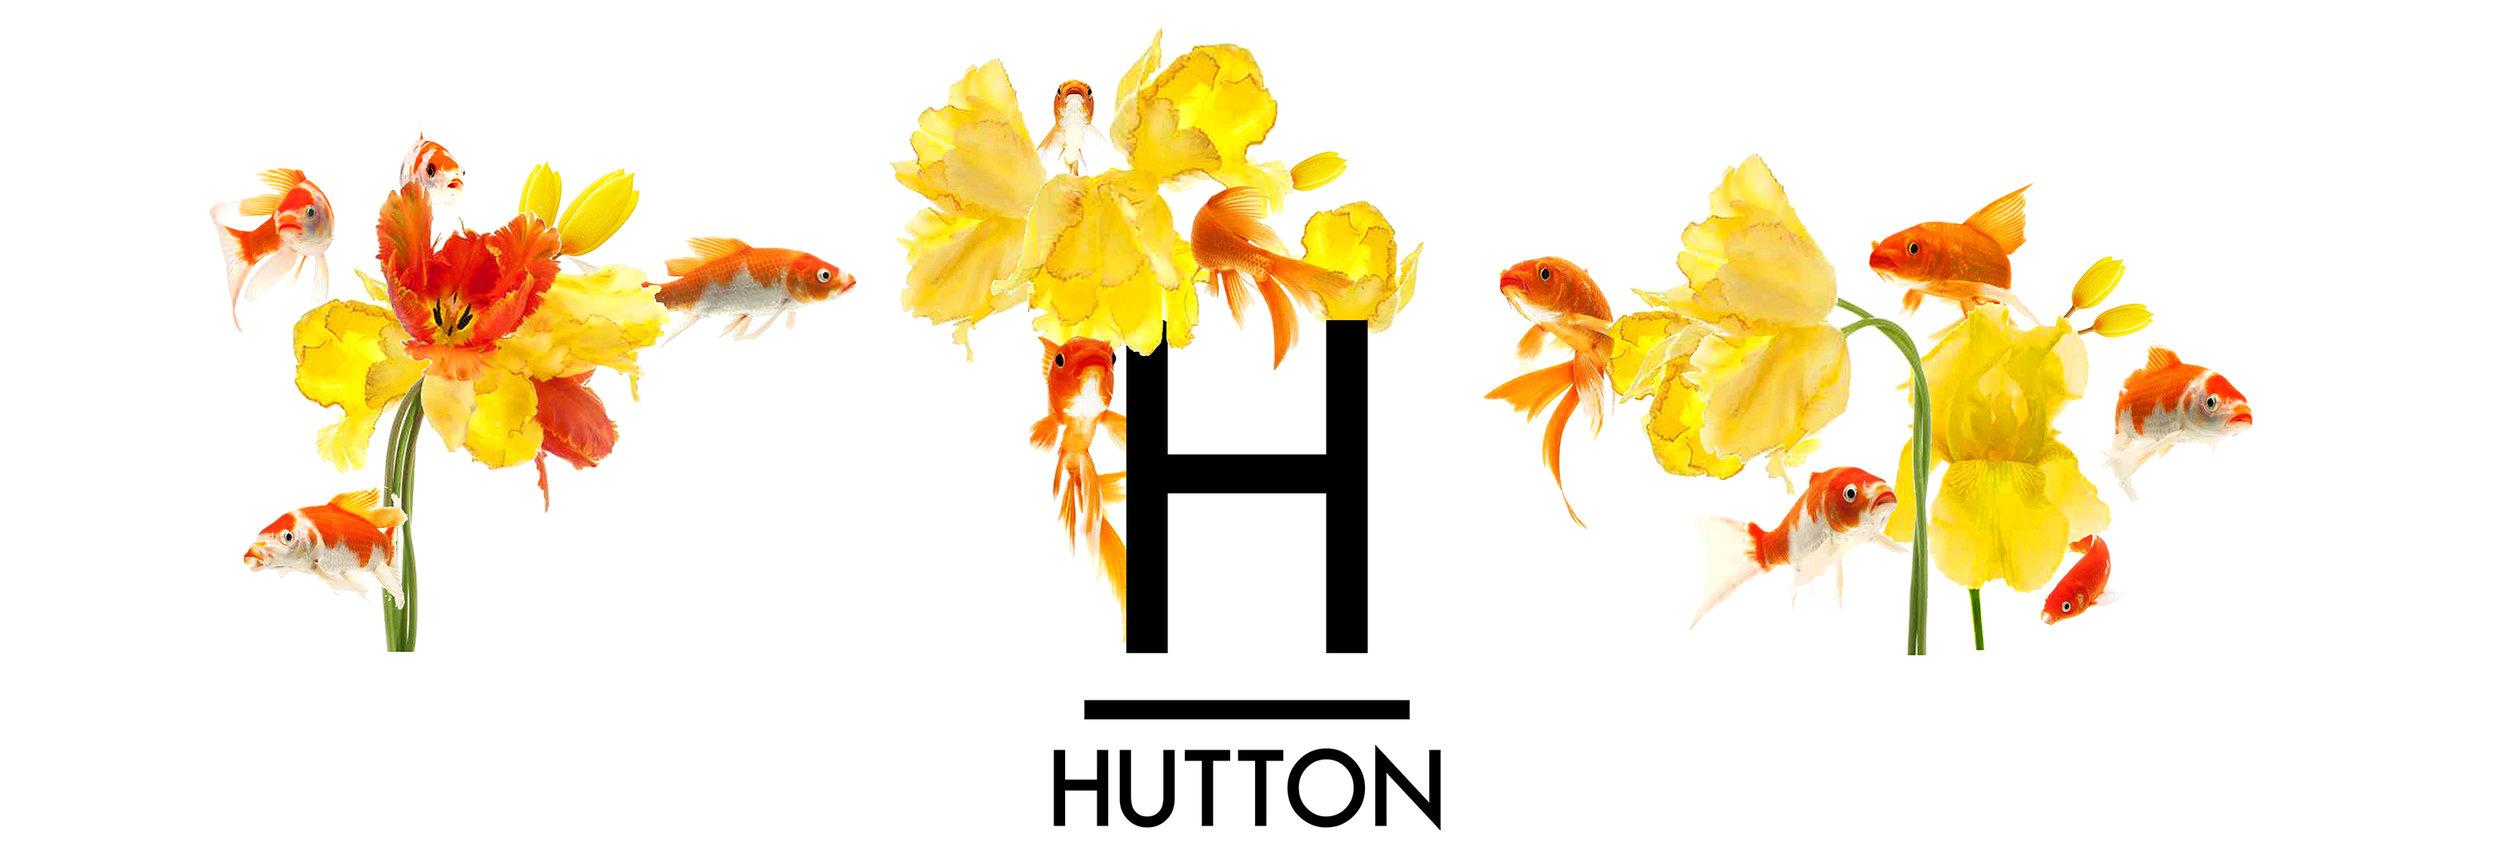 whwWeb_Arkadia_Corridor_Hutton.jpg